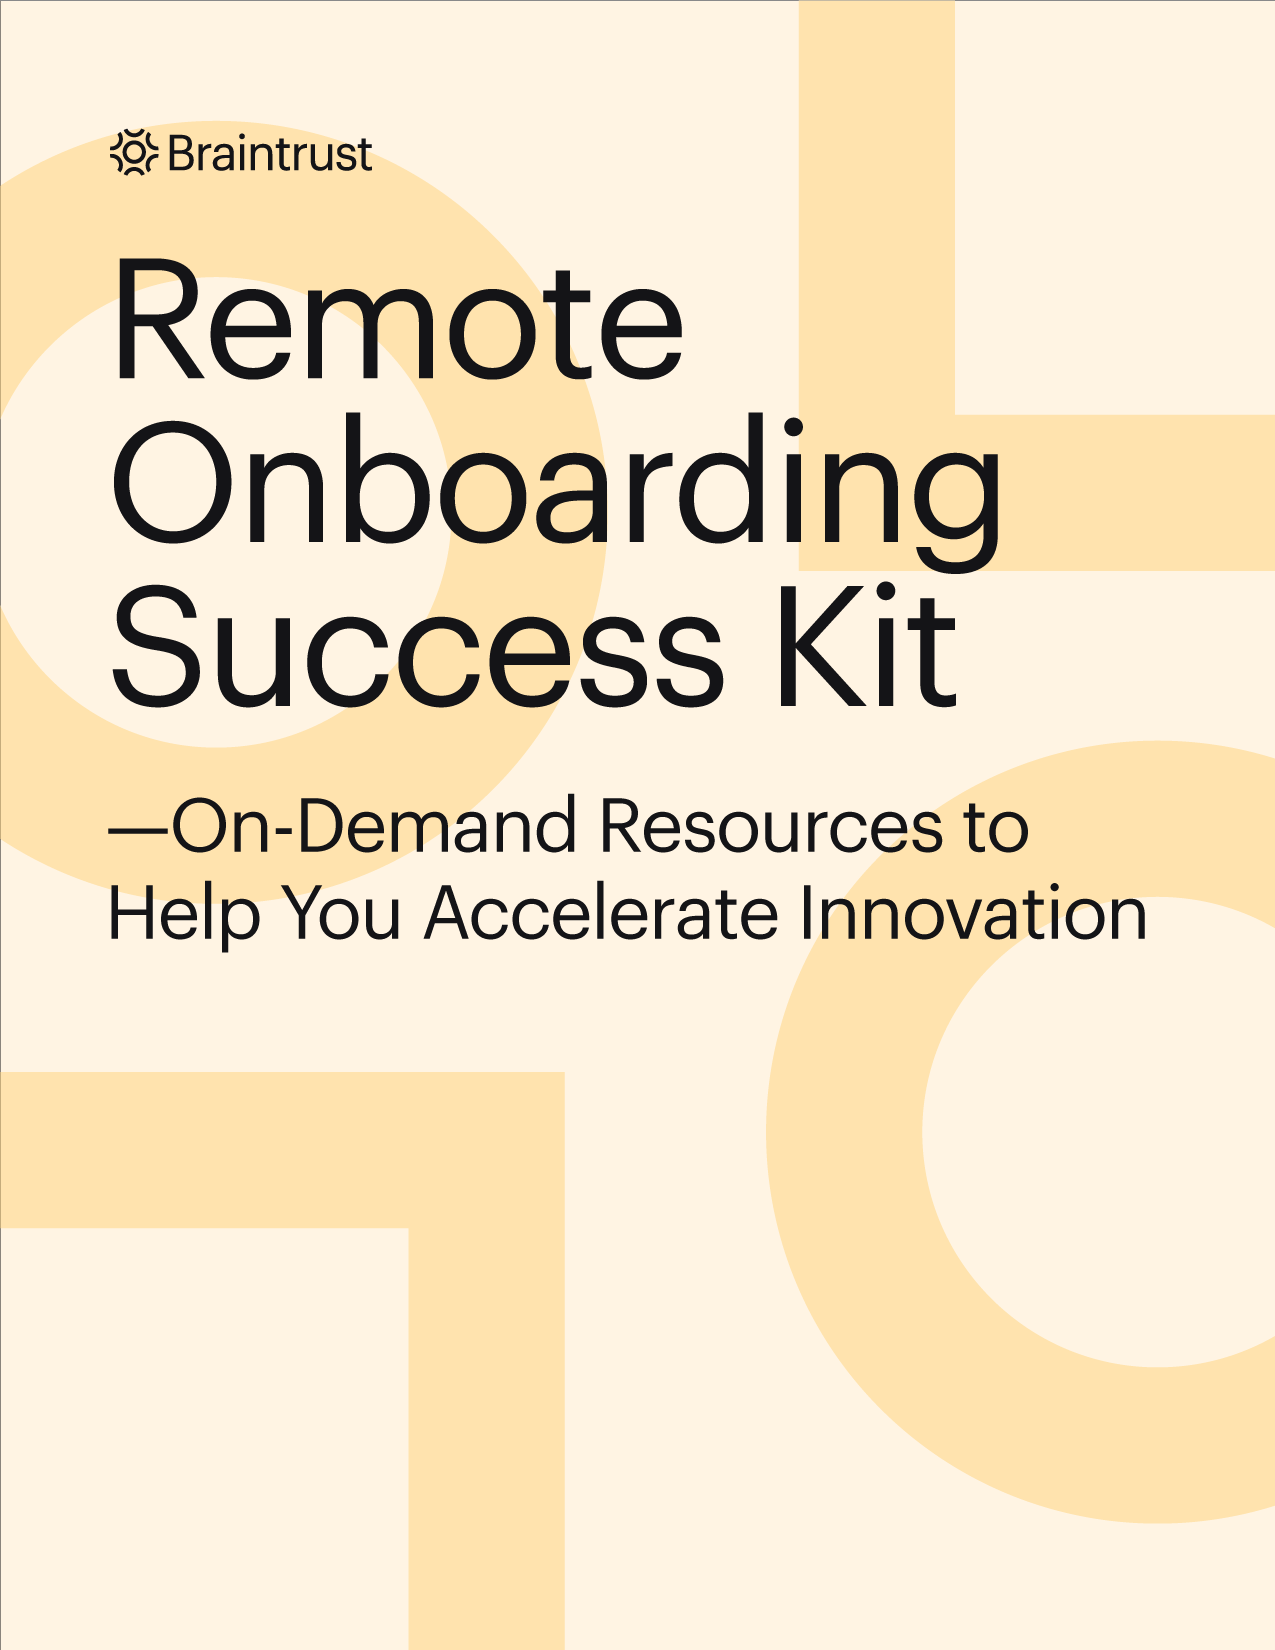 RemoteOnboarding_LandingPage_B-1